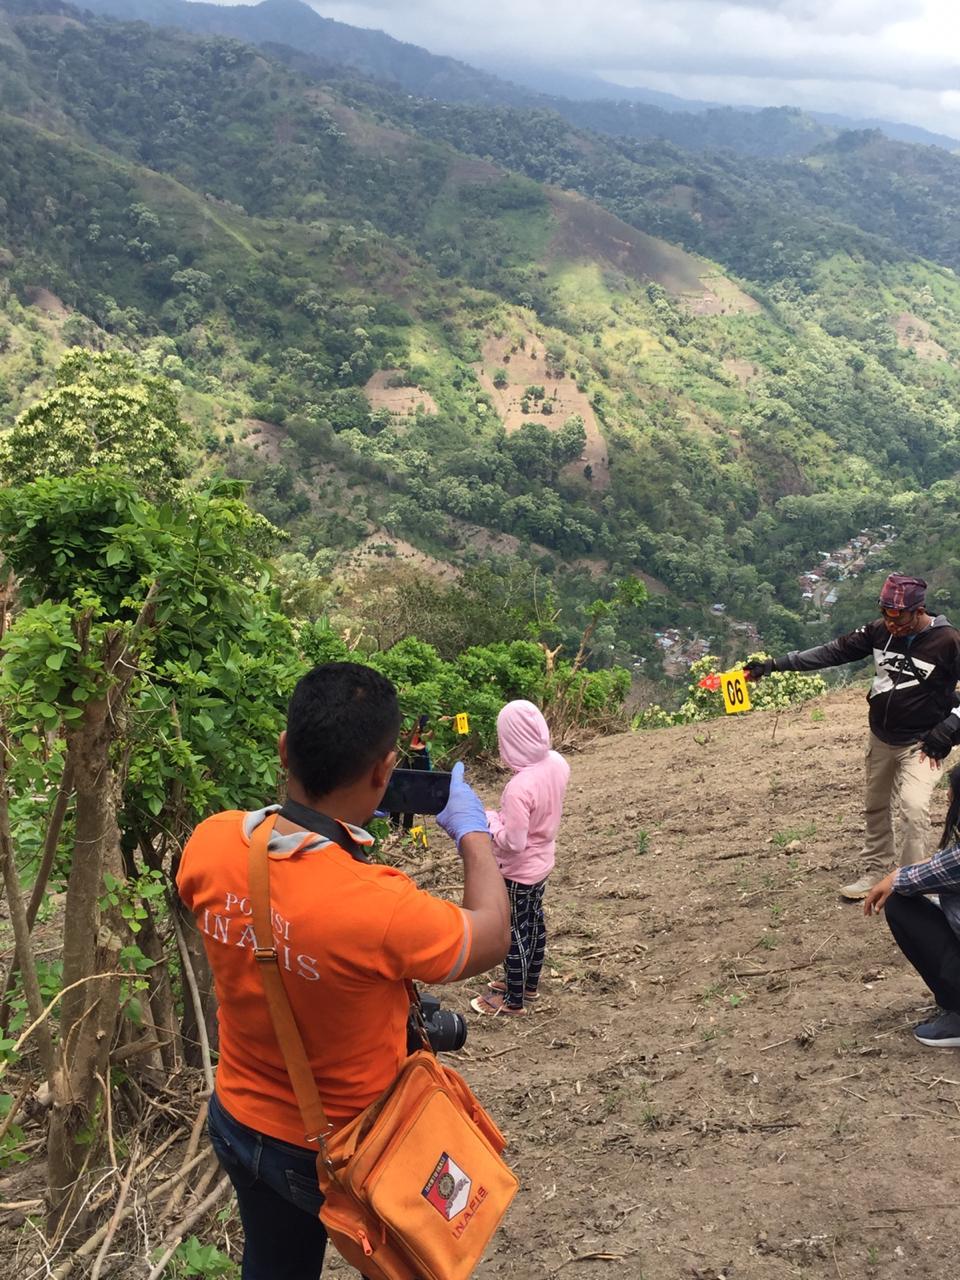 Rekonstruksi kasus dugaan pemerkosaan di lereng Dusun Welakiro, Desa Wolorega Kecamatan Paga, Sikka NTT. Foto: Lintasnusanews.com/Karel Pandu